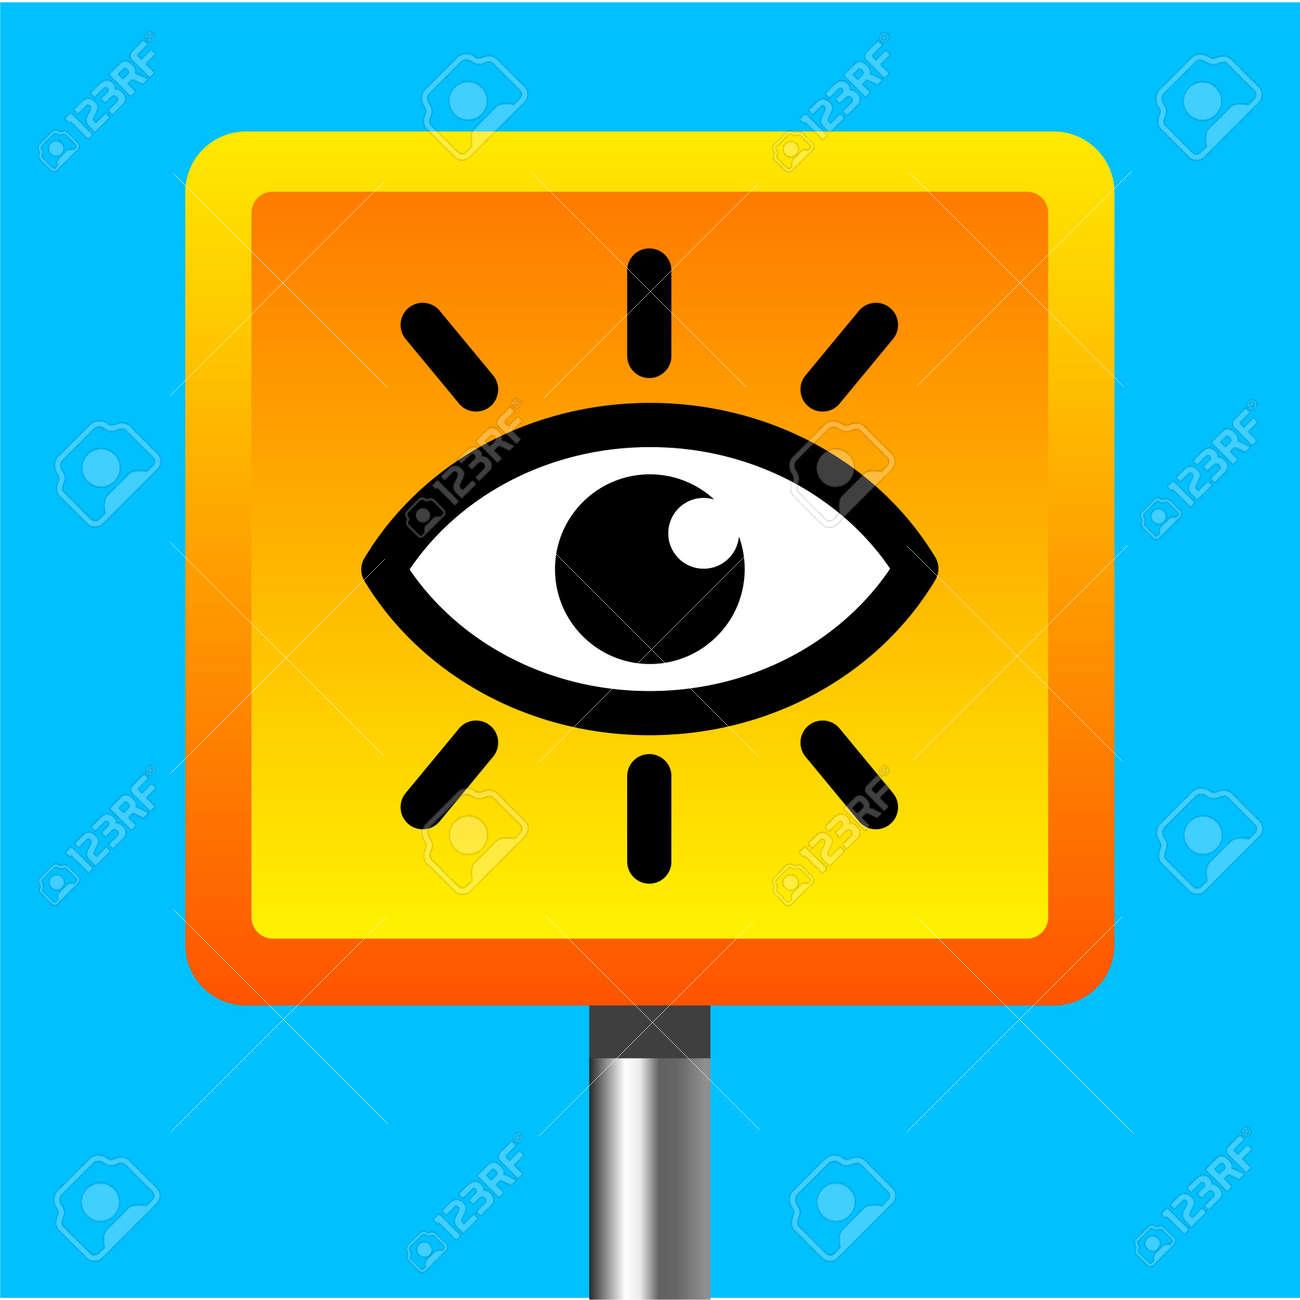 video surveillance camera sign Stock Vector - 12345169